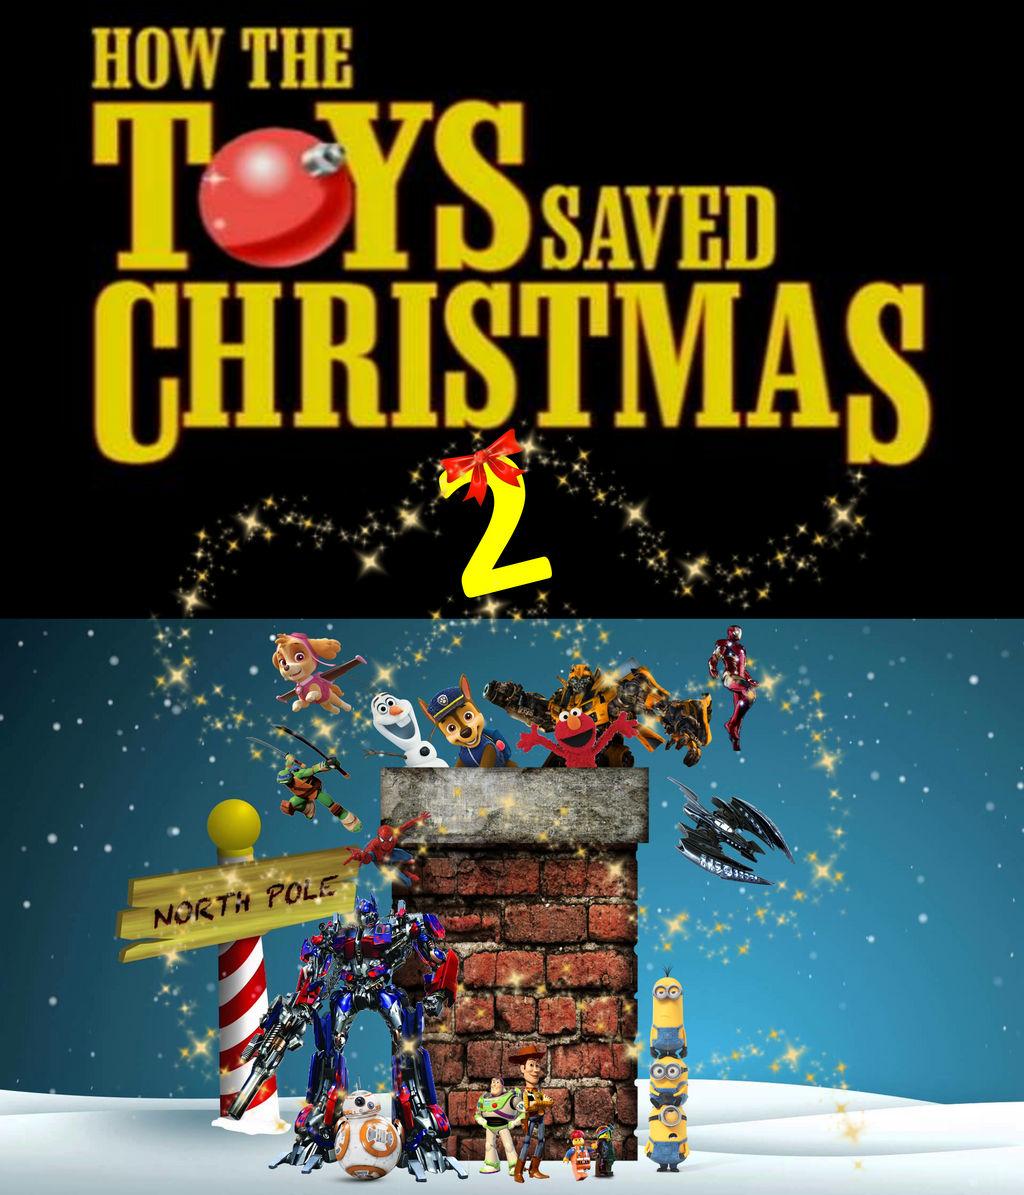 The Bears Who Saved Christmas.How The Toys Saved Christmas 2 By Nightmarebear87 On Deviantart